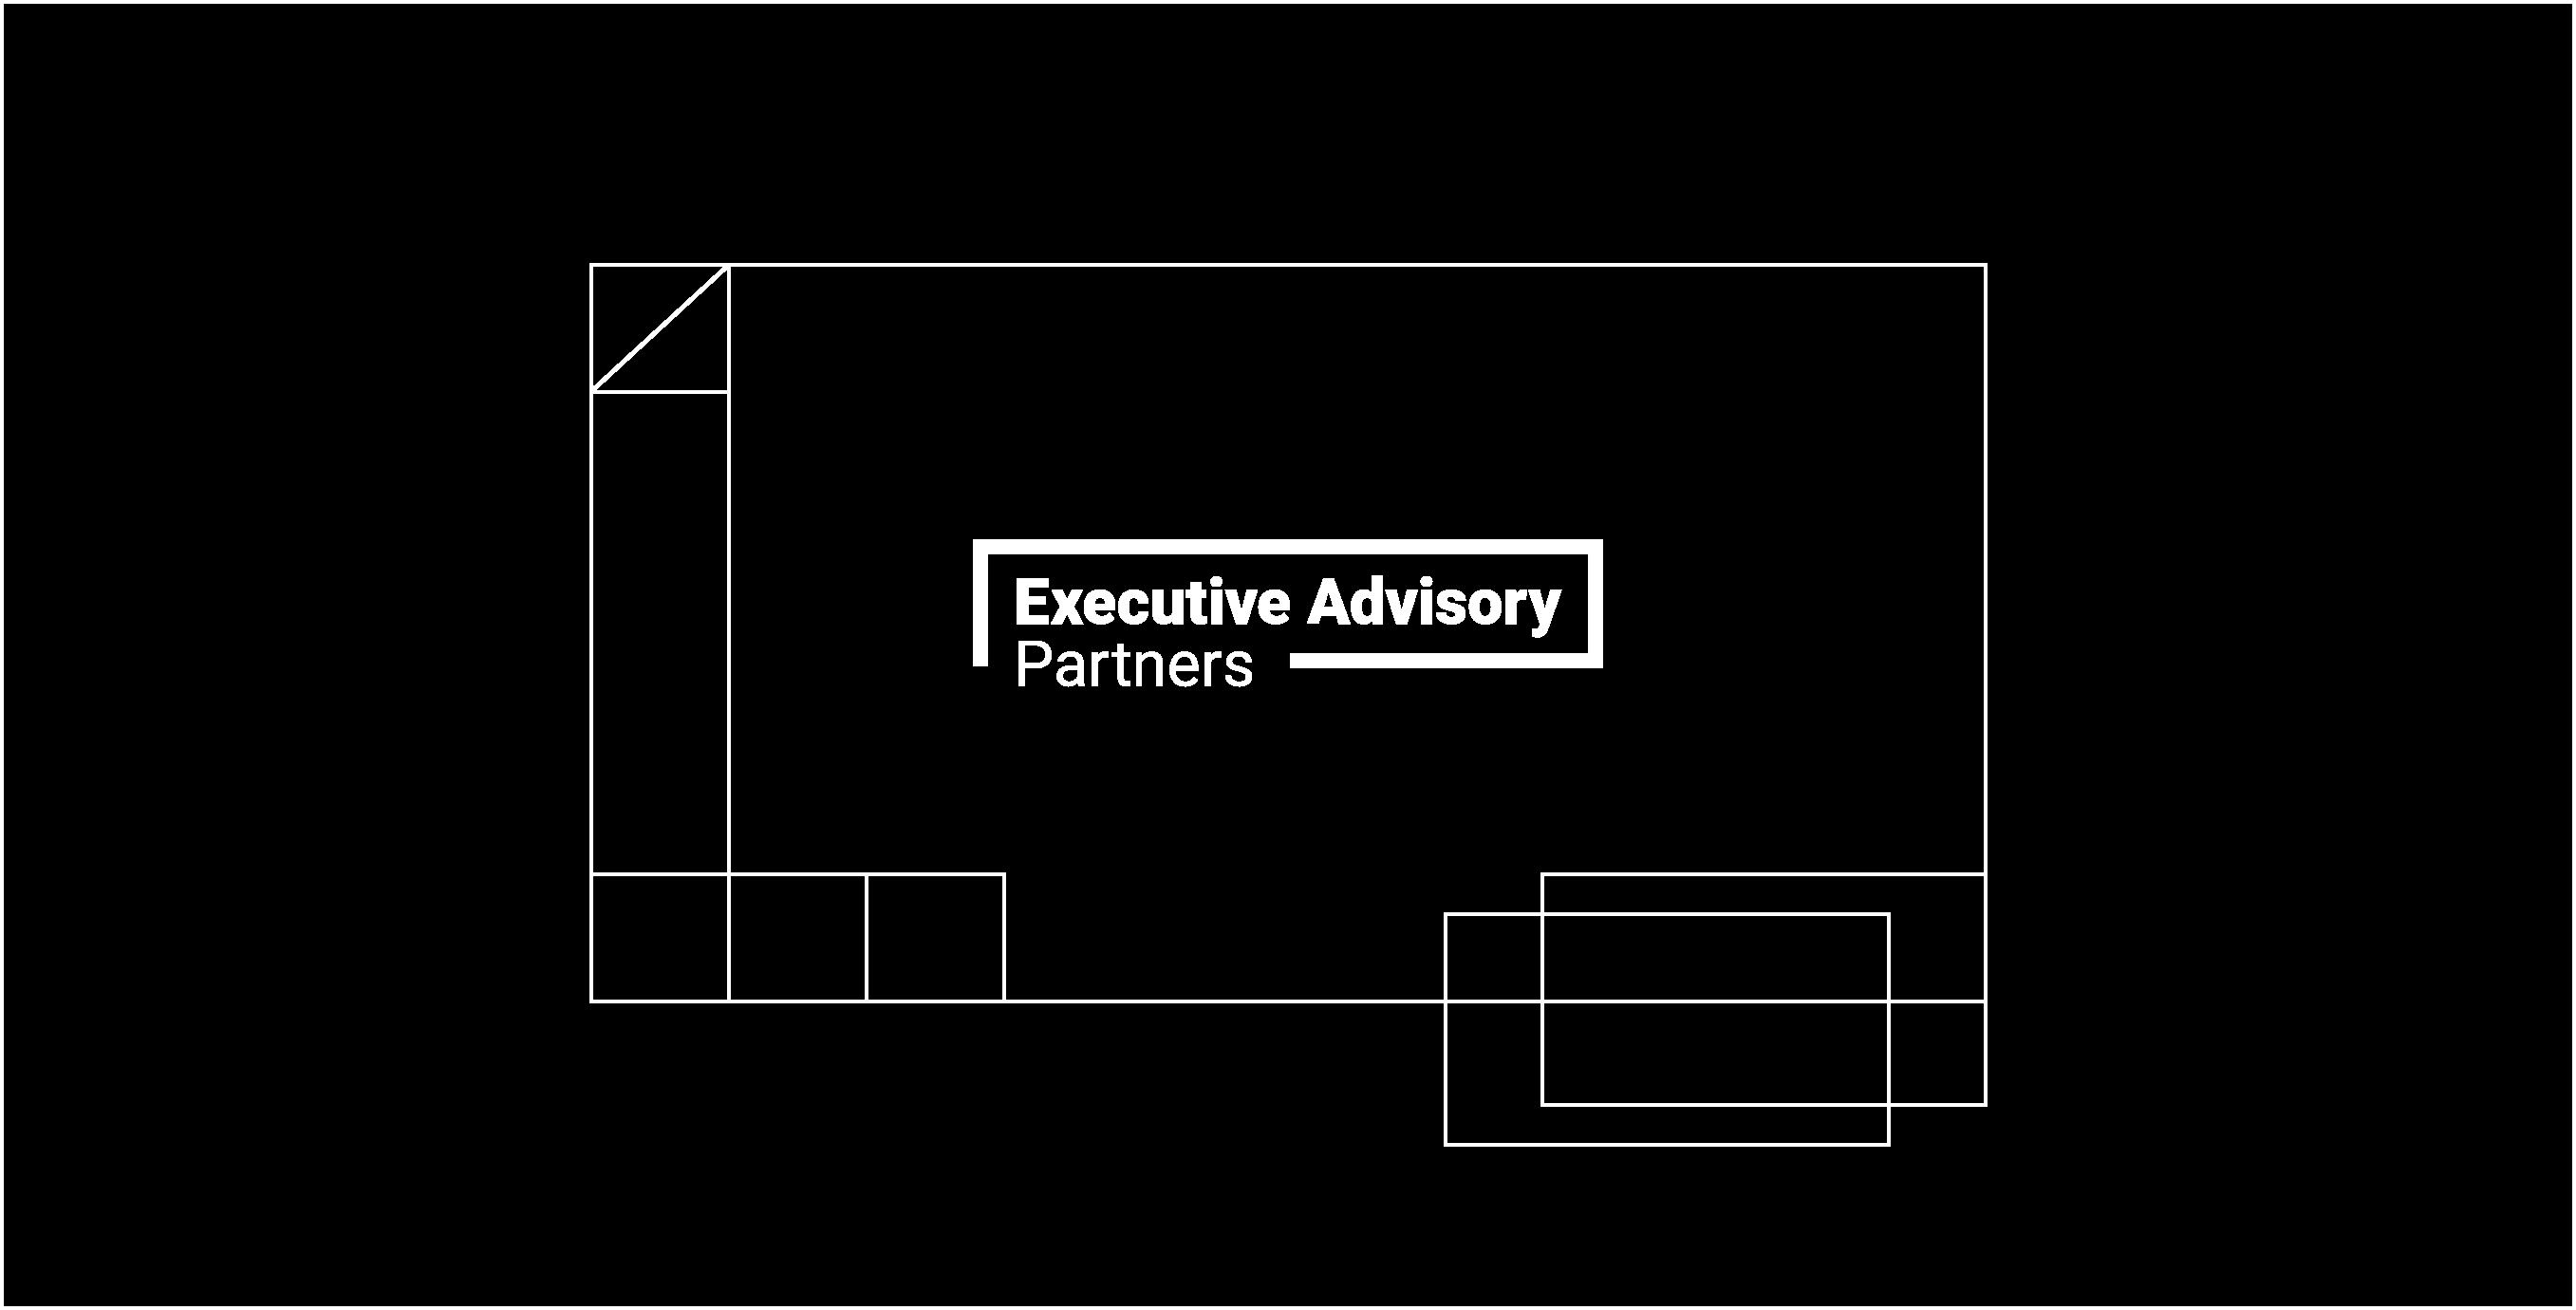 Executive Advisory Partners